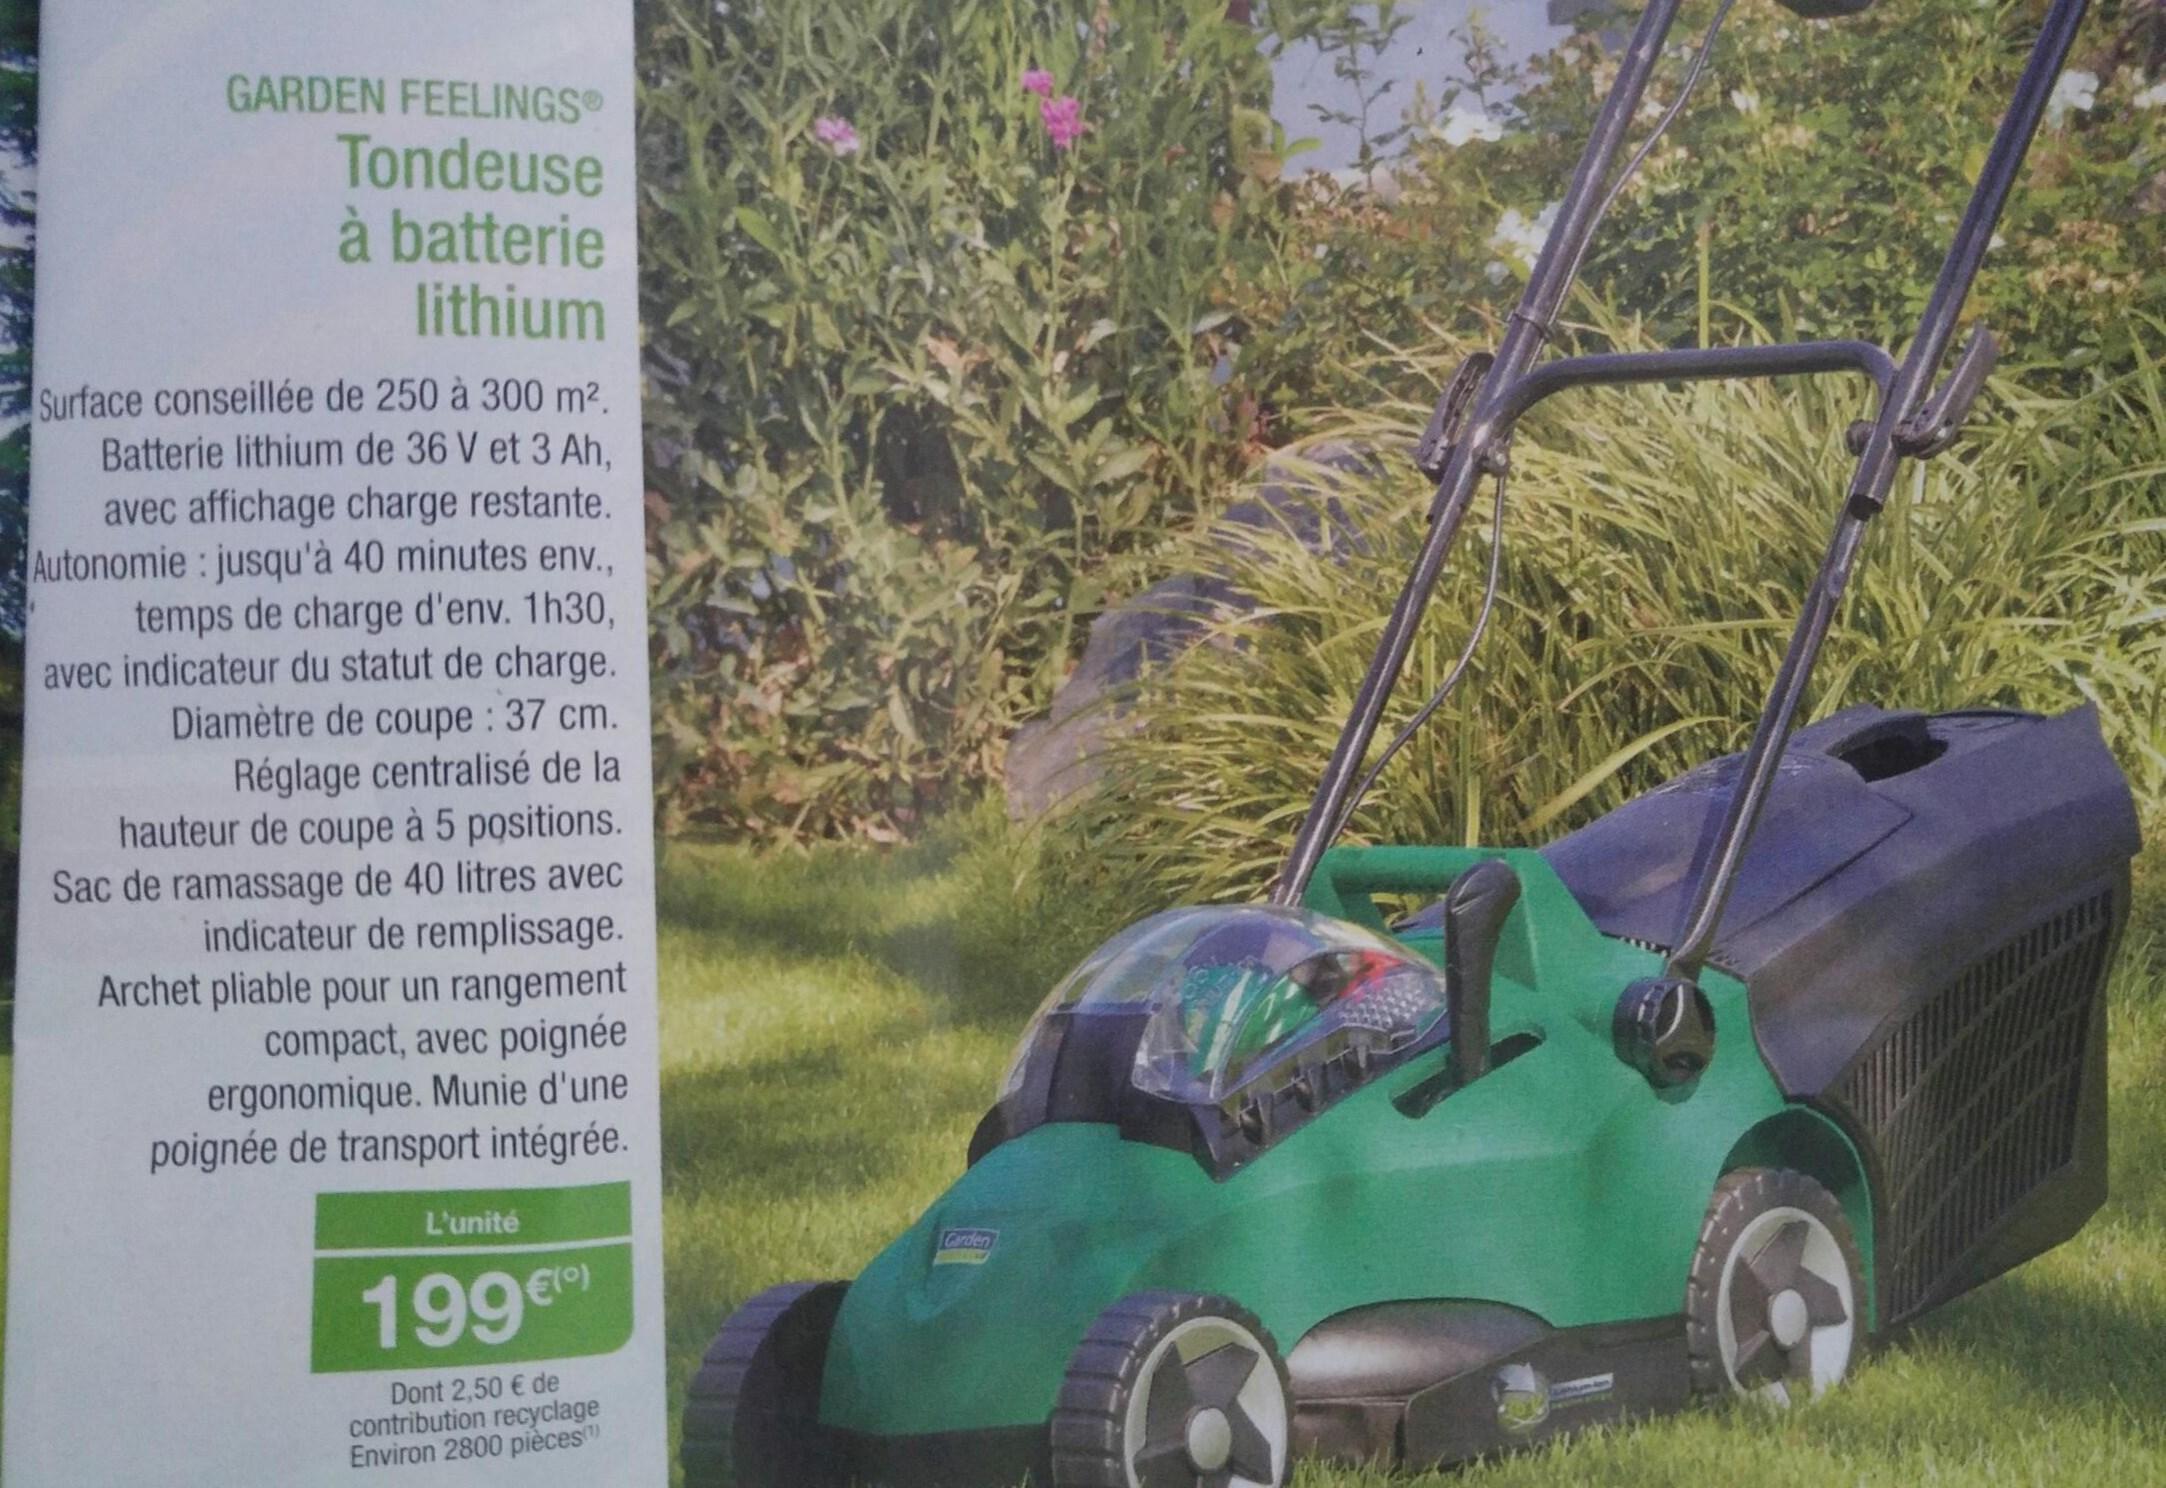 Tondeuse Garden Feelings - batterie lithium